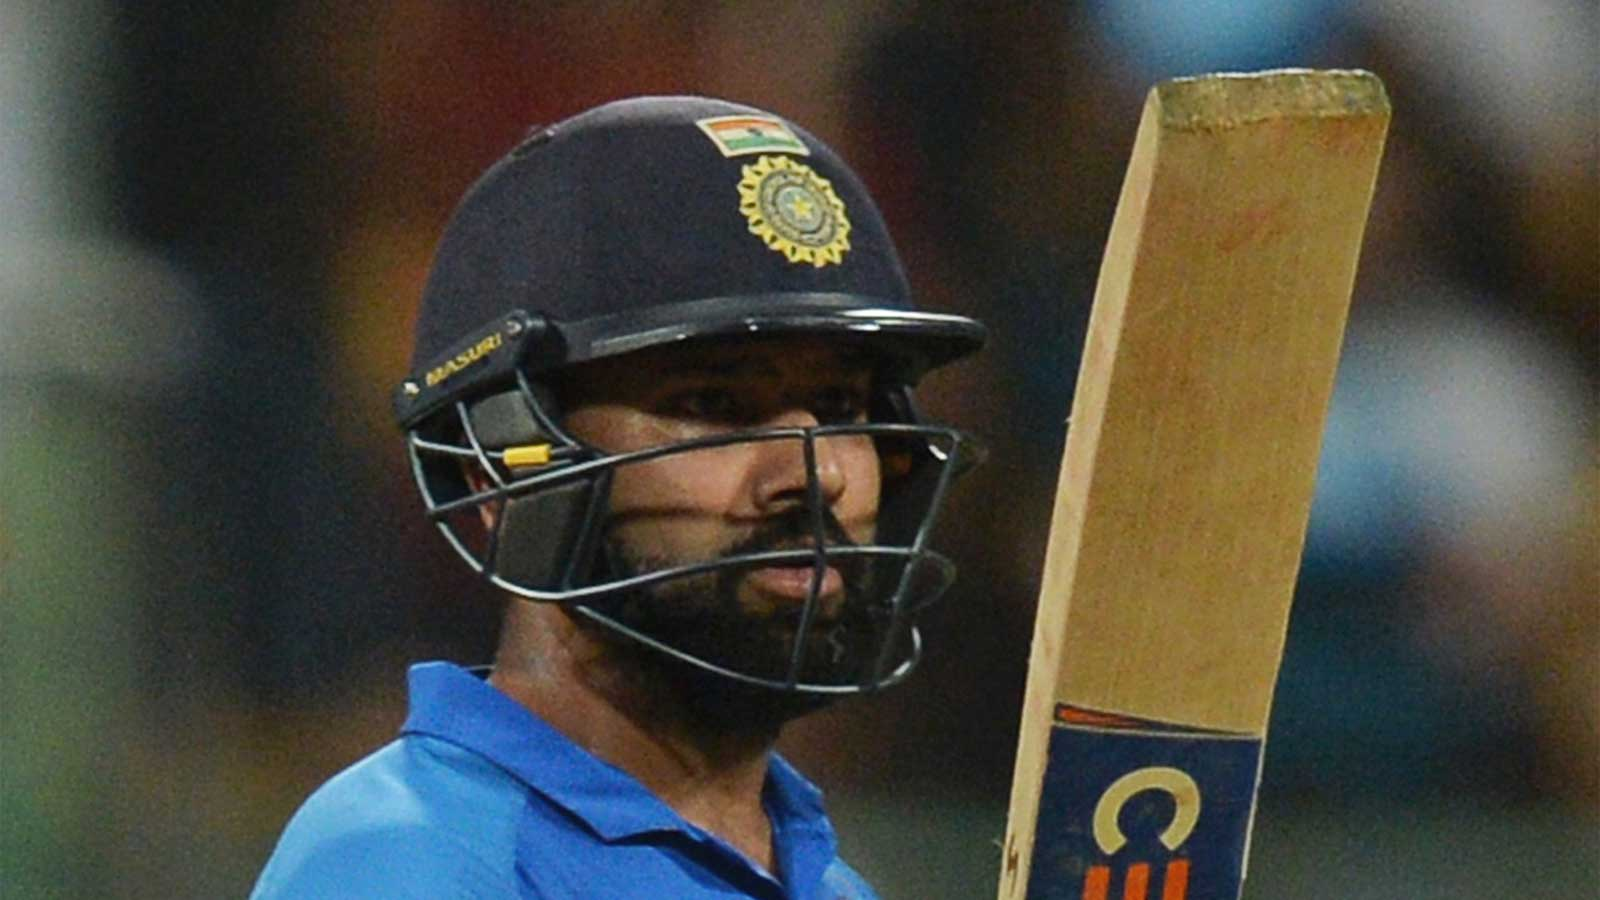 lack-of-clarity-on-status-of-rohit-sharmas-injury-india-captain-virat-kohli